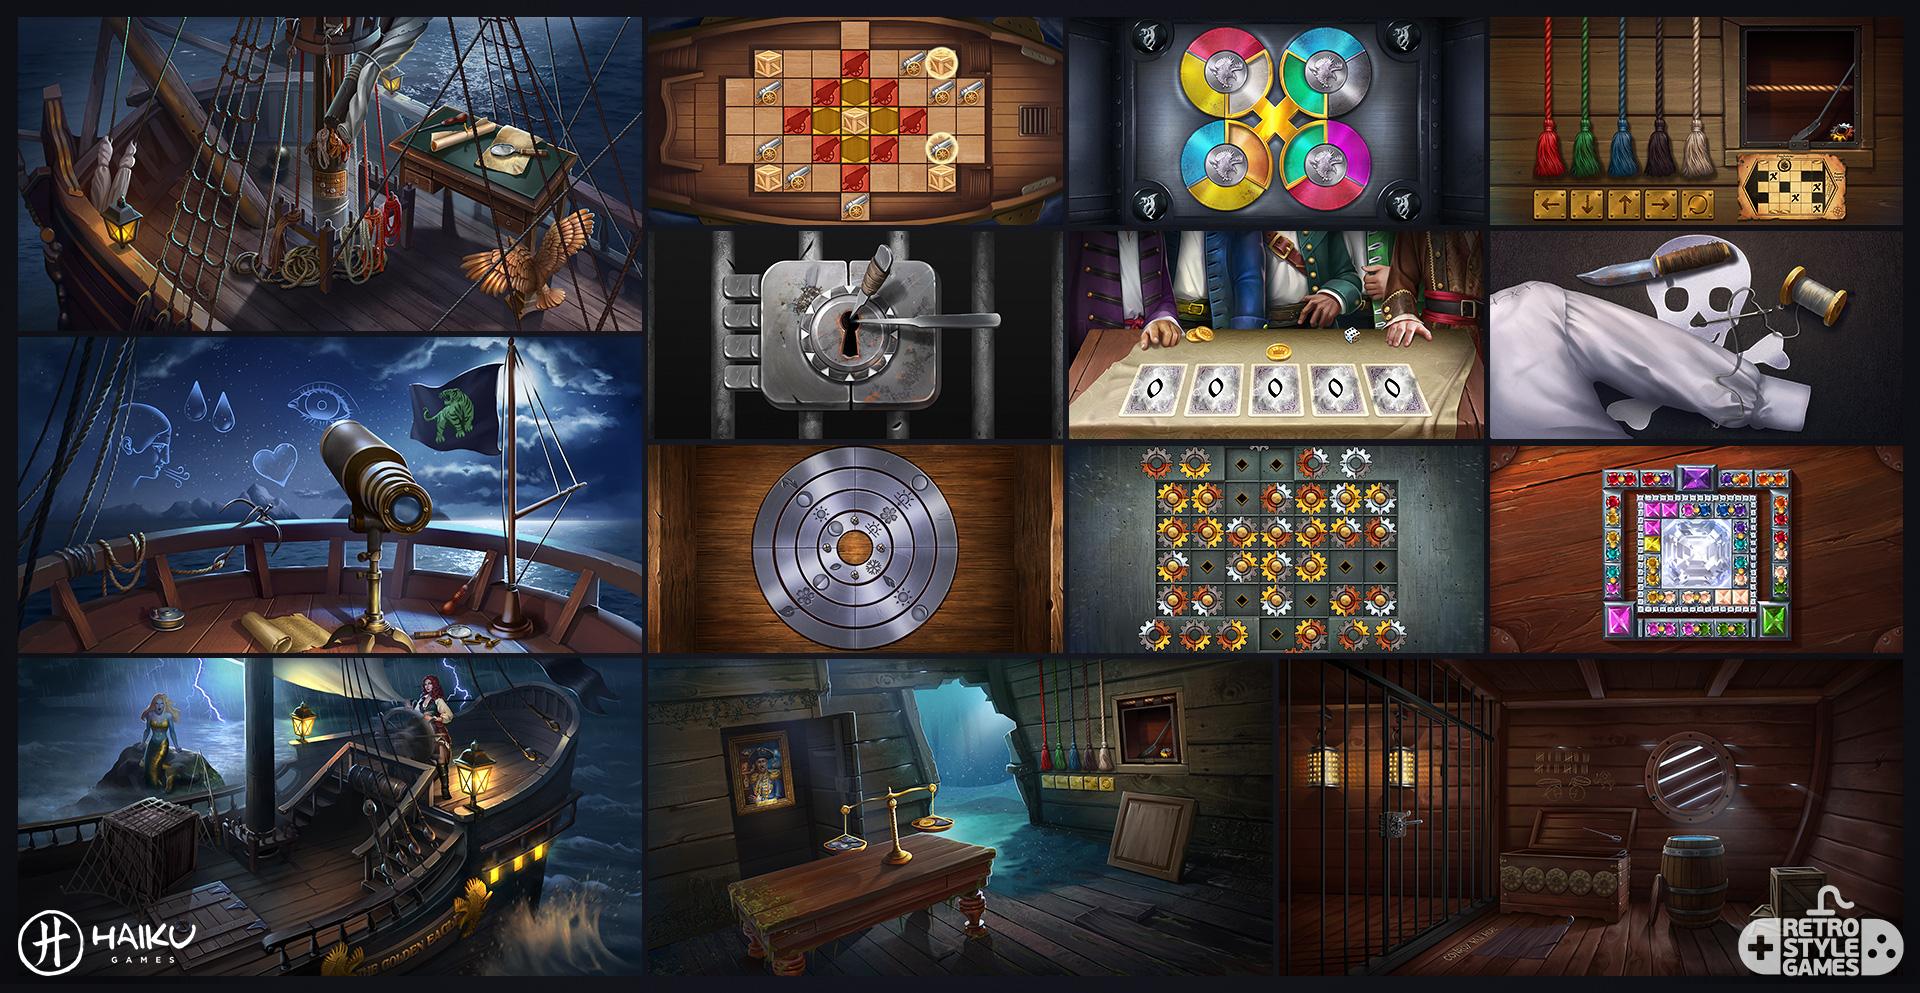 Haiku HOG 2D Background Puzzle Pirate Ship